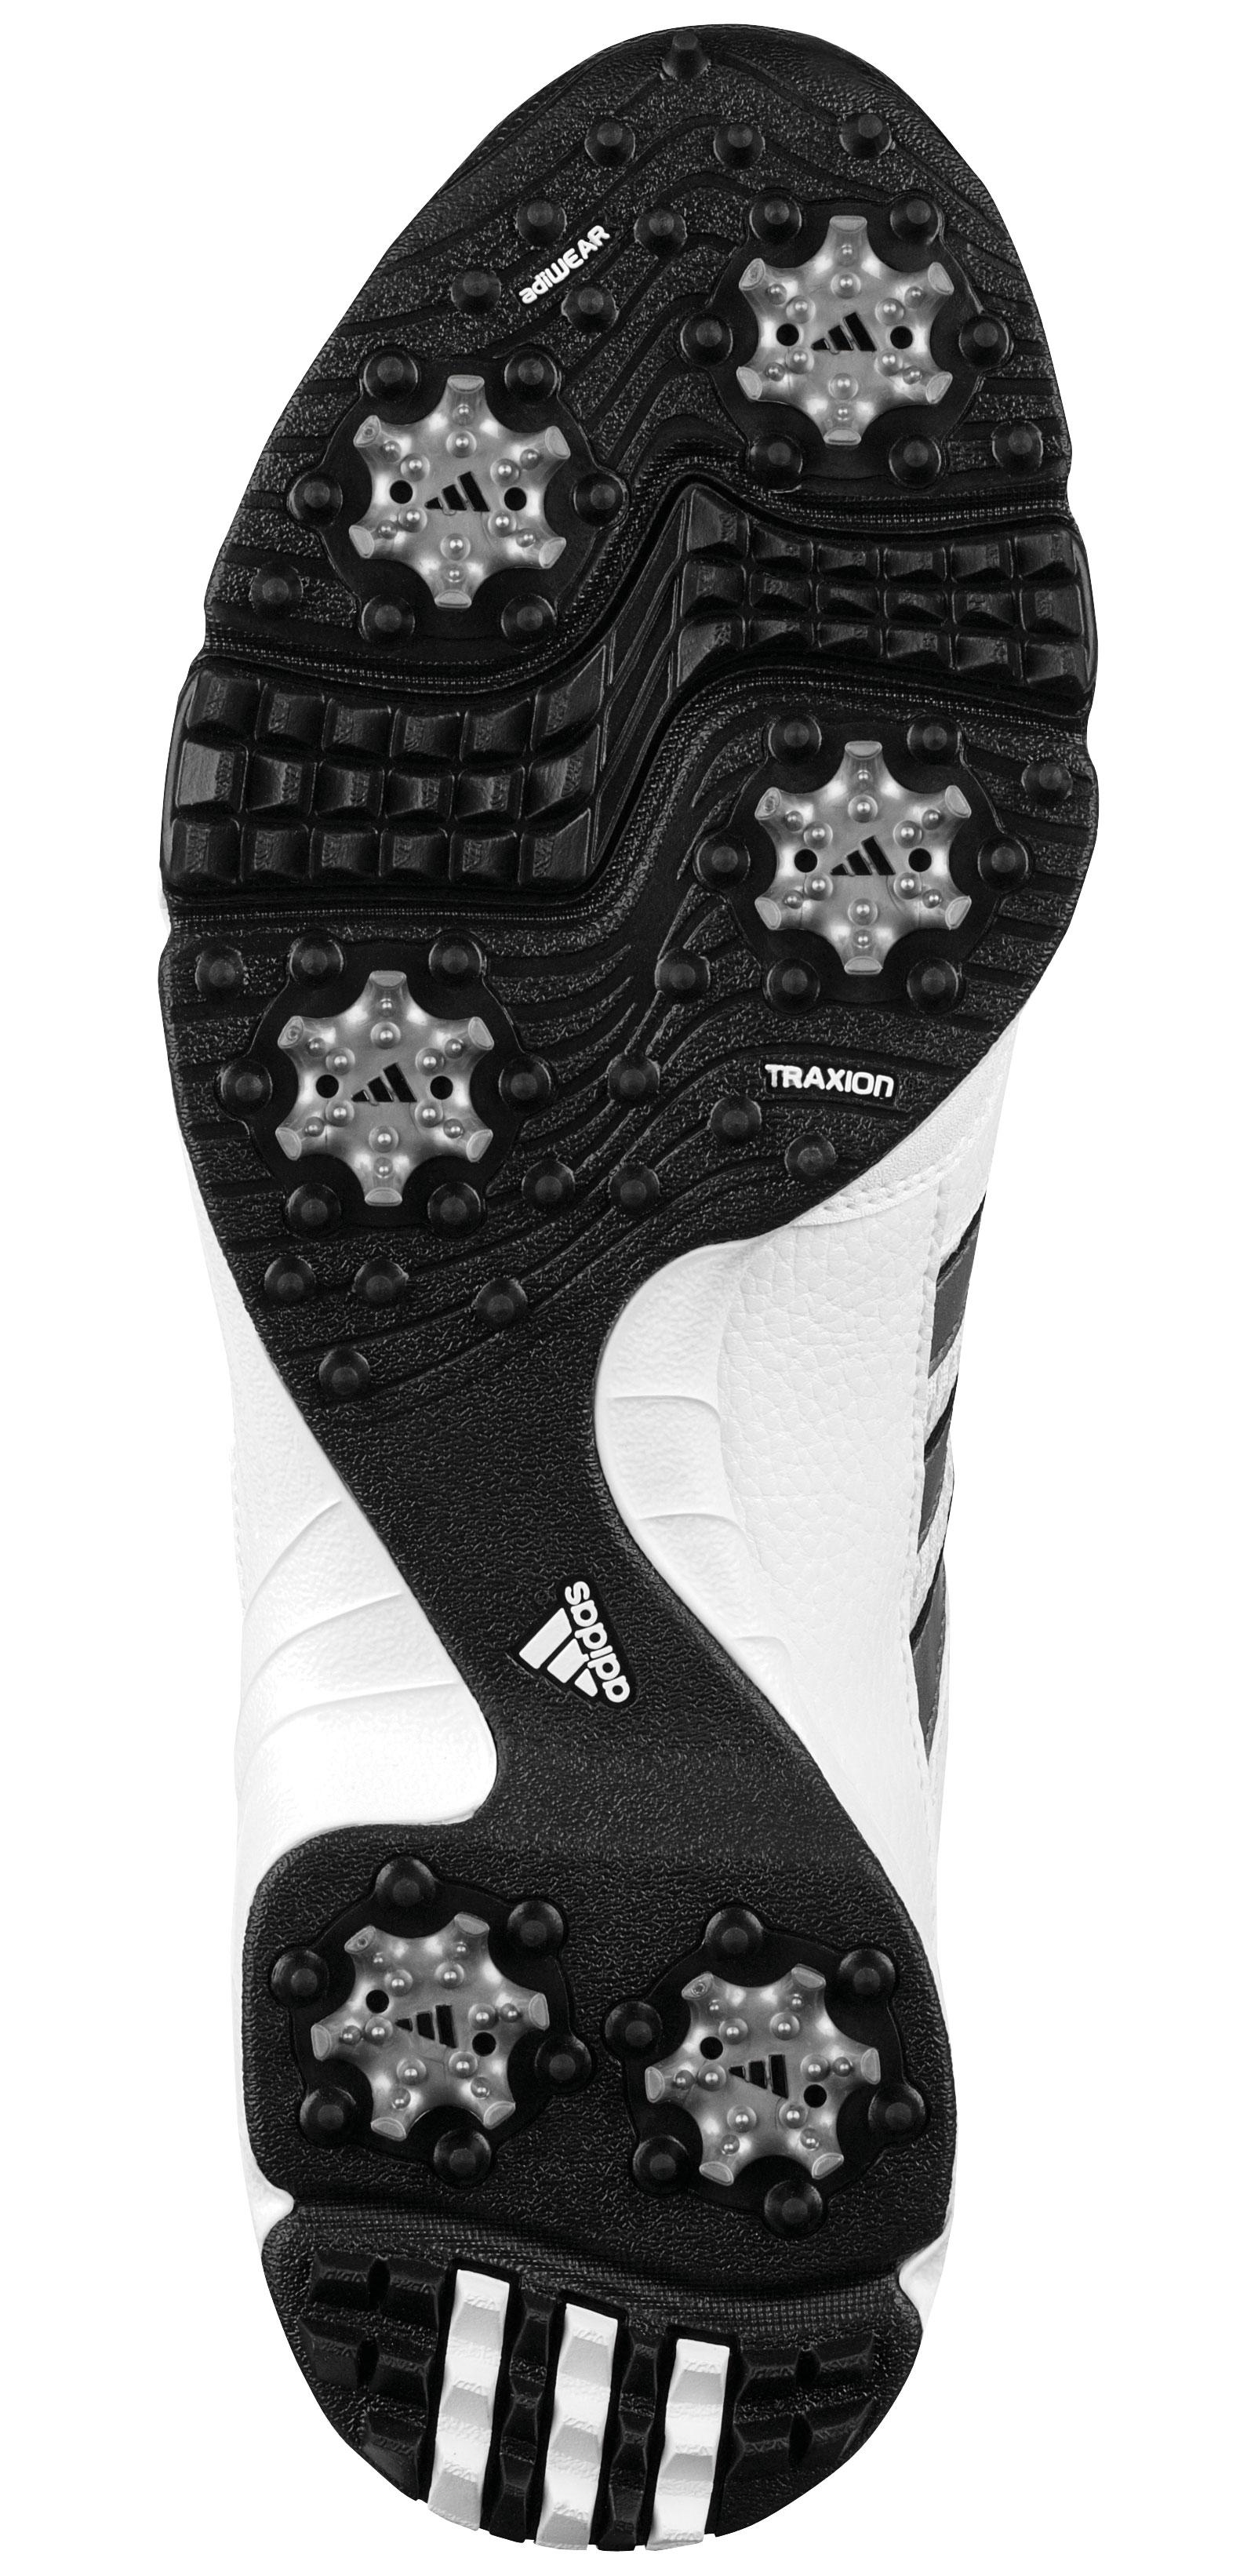 Adidas-Tech-Response-4-0-Golf-Shoes-Mens-2017-New-Choose-Color-amp-Size thumbnail 5